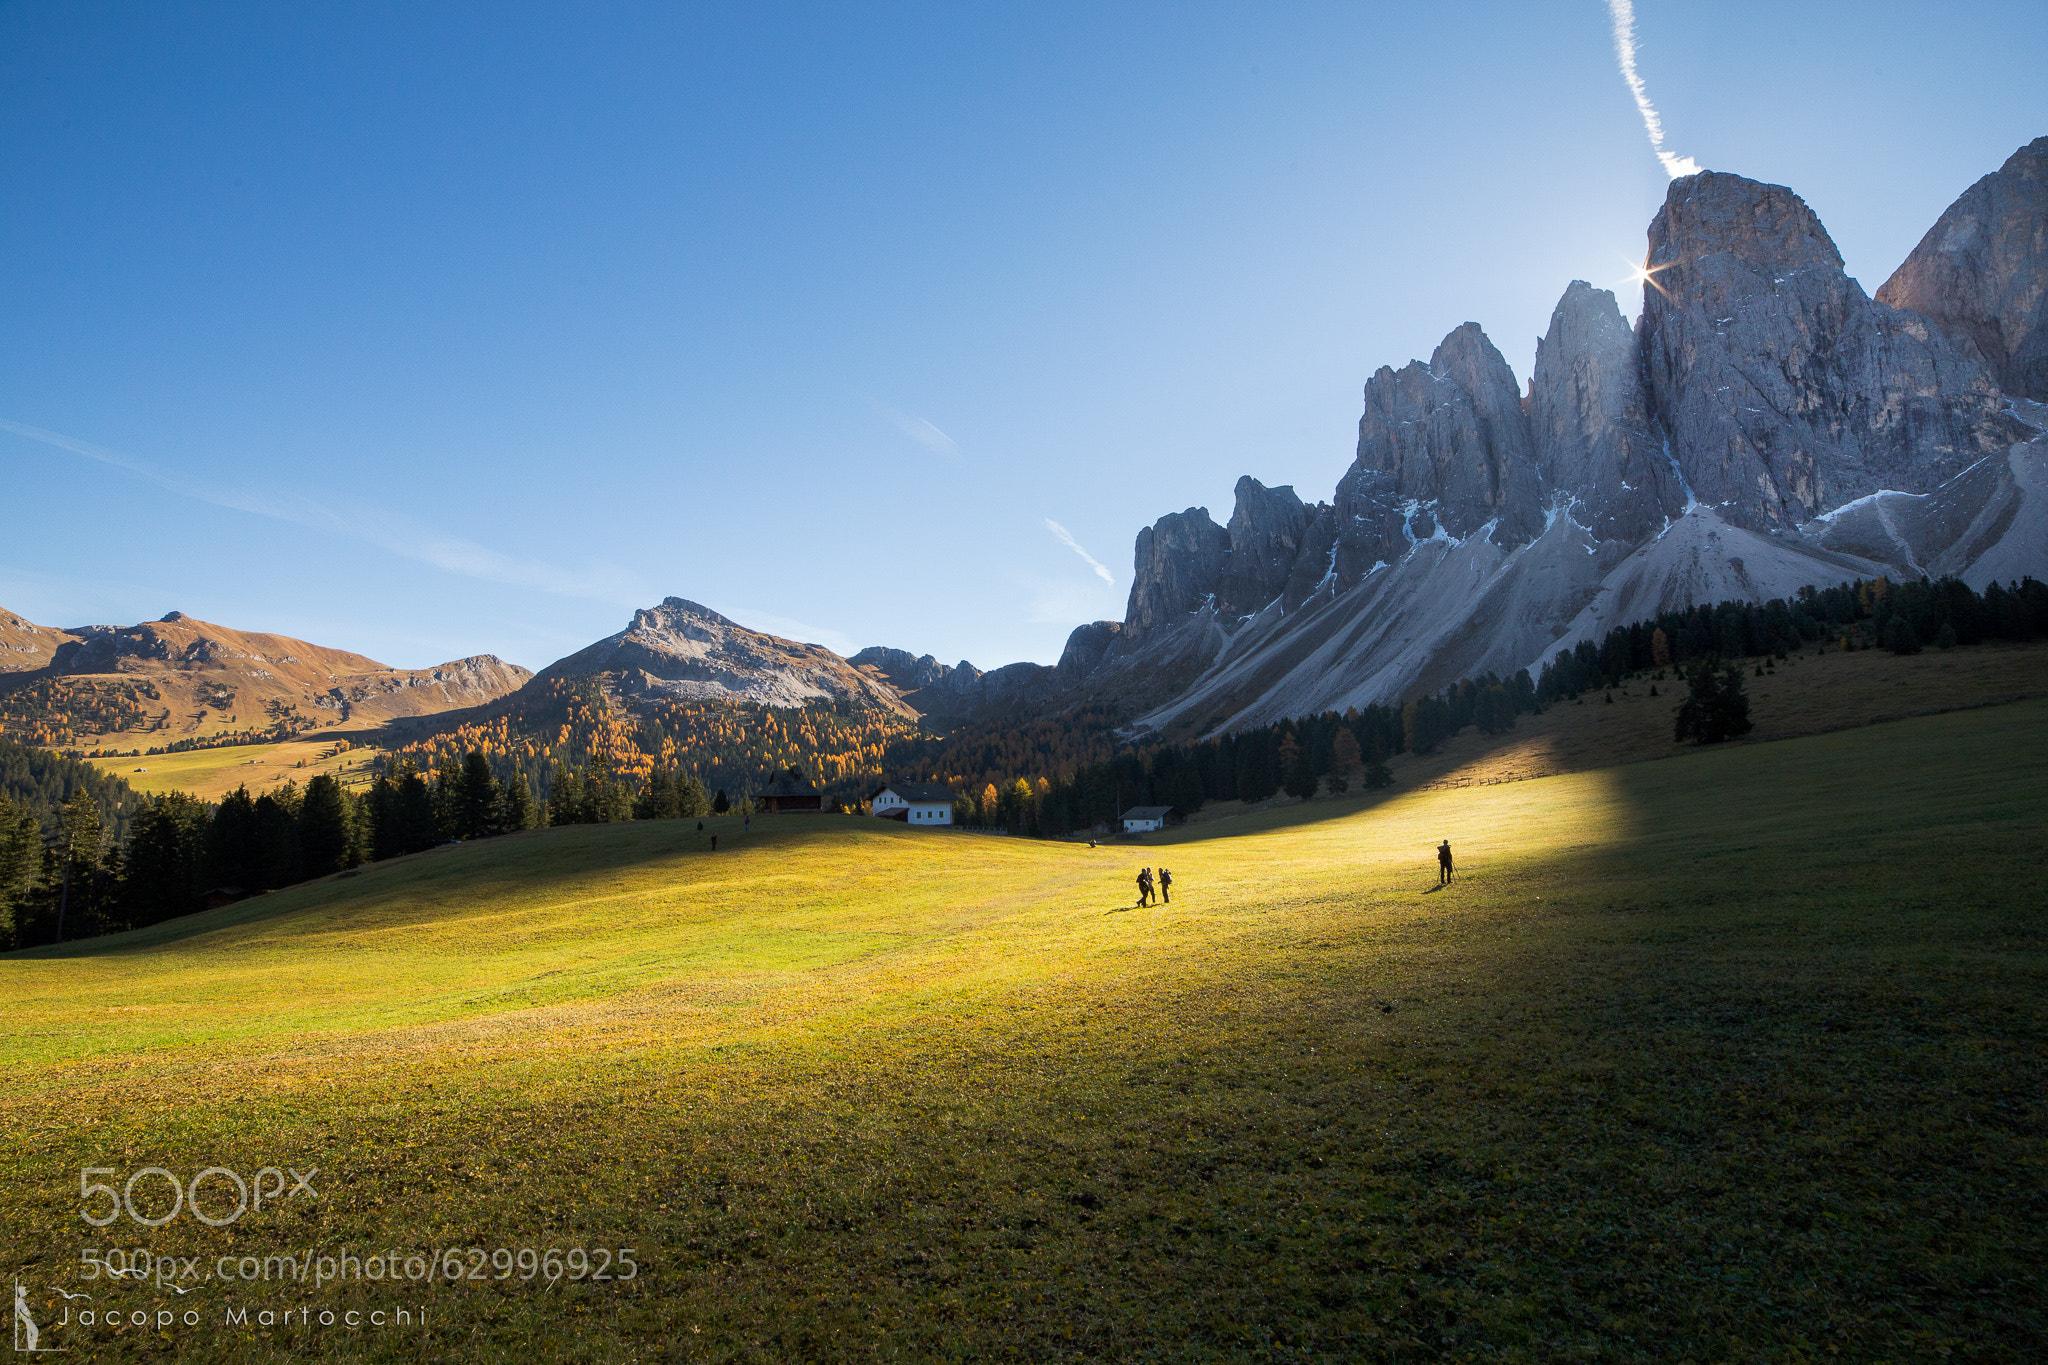 500px 上の Jacopo Martocchi の写真 Ombre Tirolesi